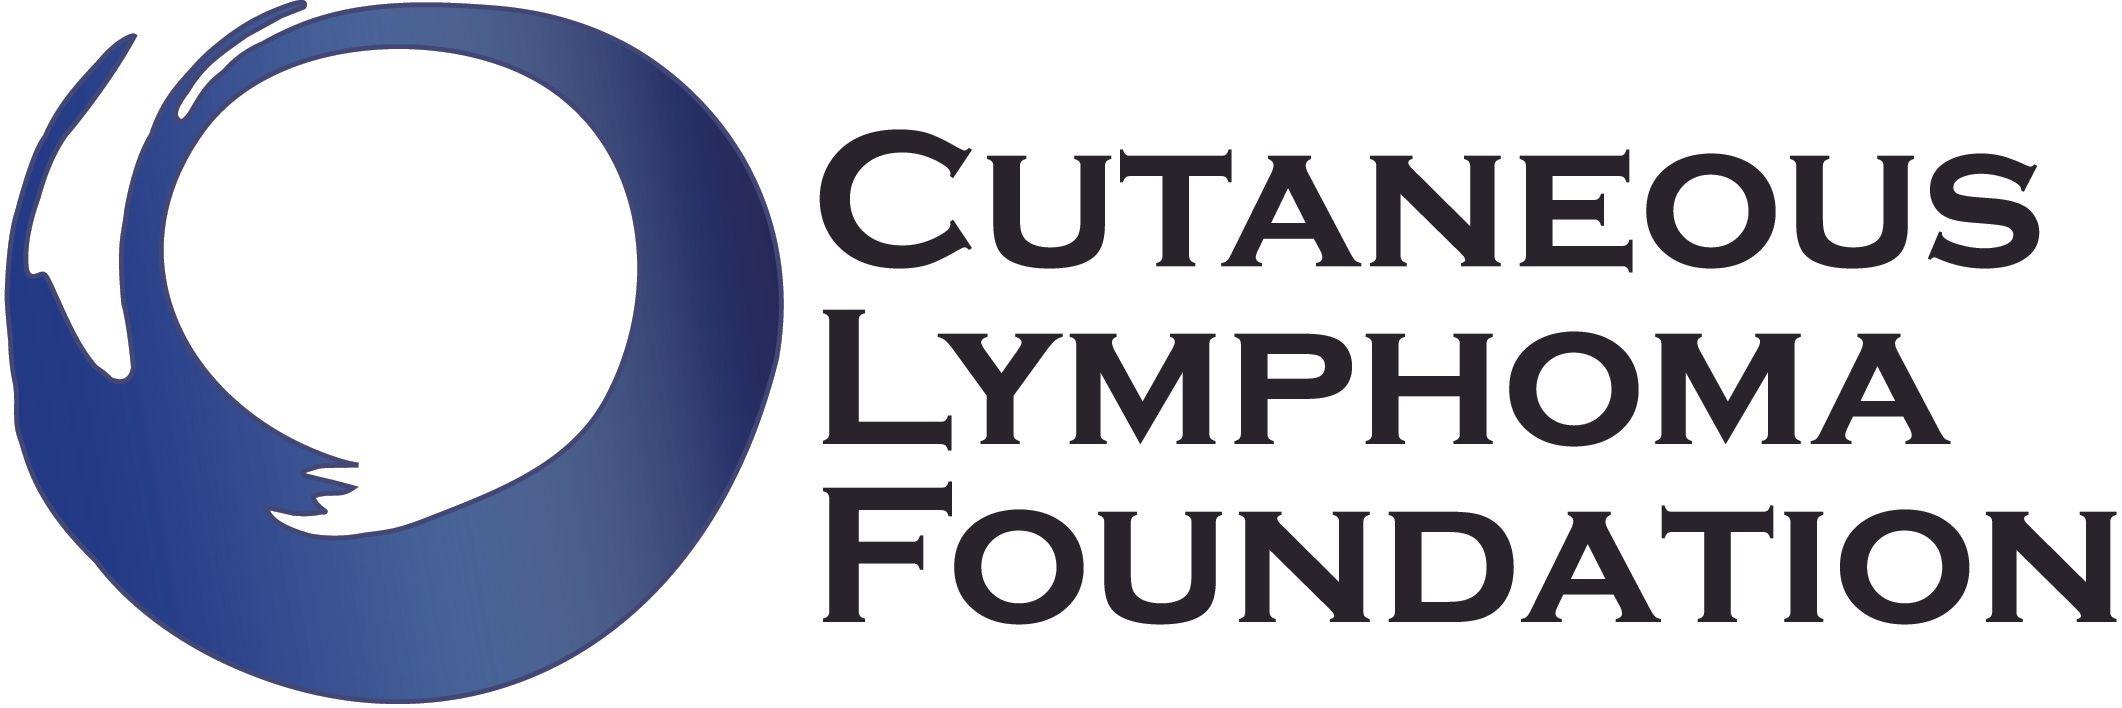 Cutaneous Lymphoma Foundation logo